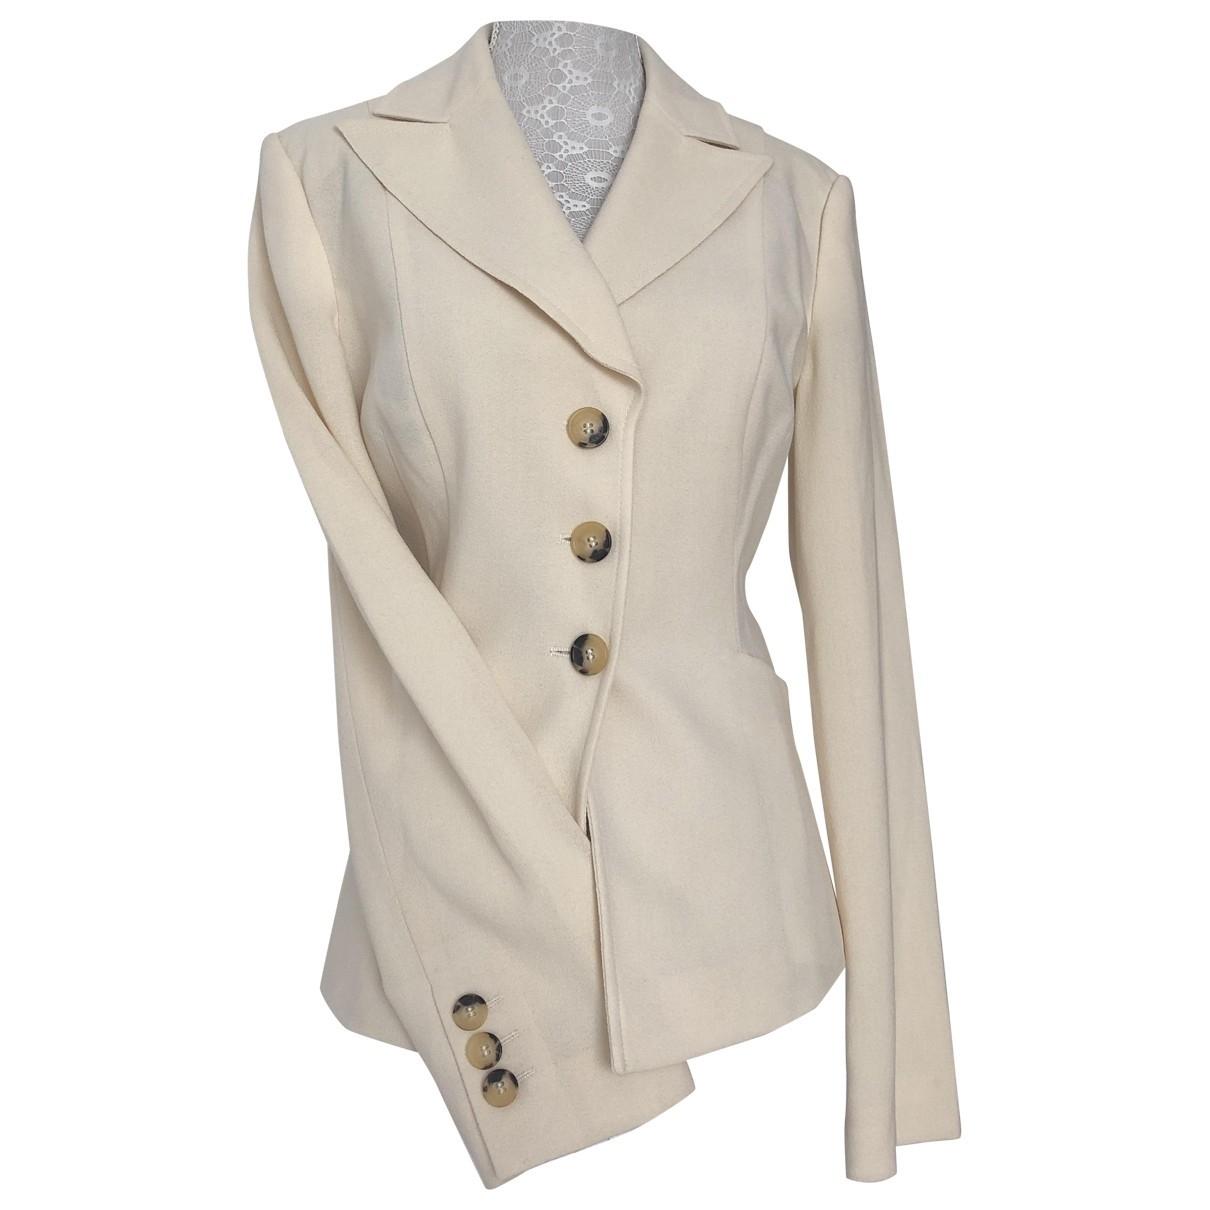 Red Valentino Garavani \N Beige Wool jacket for Women 44 IT